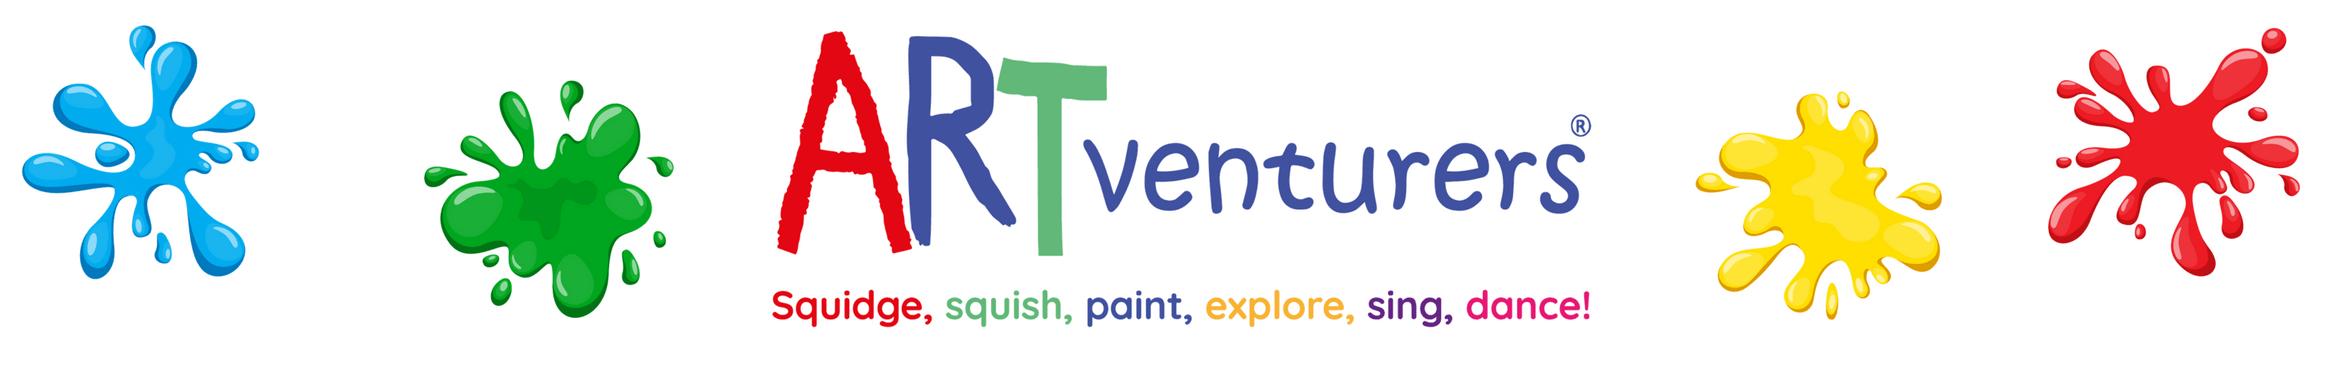 ARTventurers Nottingham